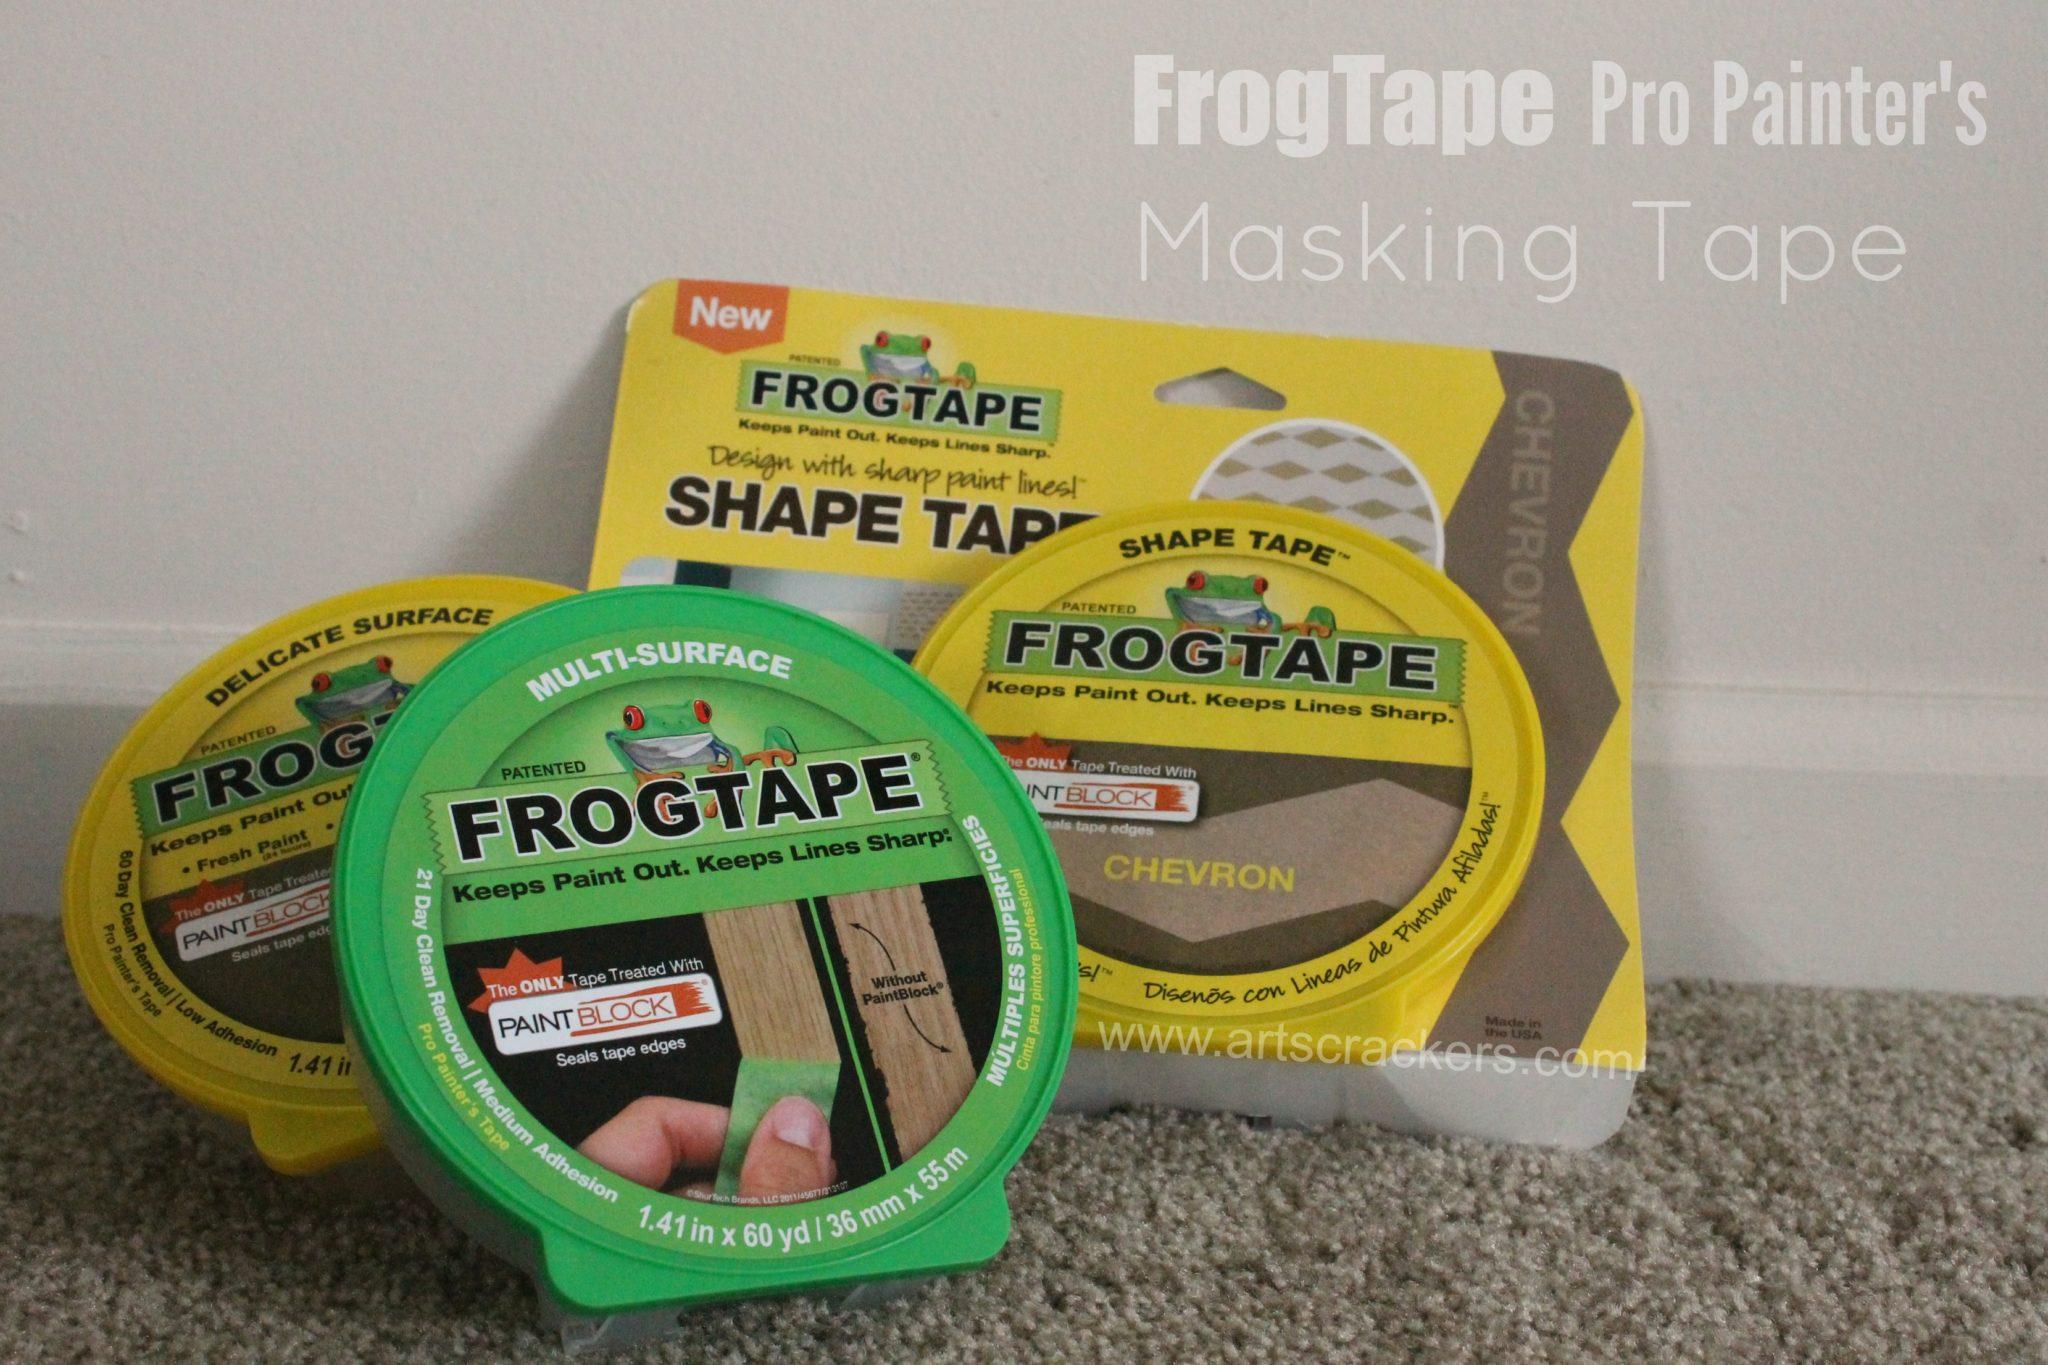 FrogTape Pro Painter Masking Tape